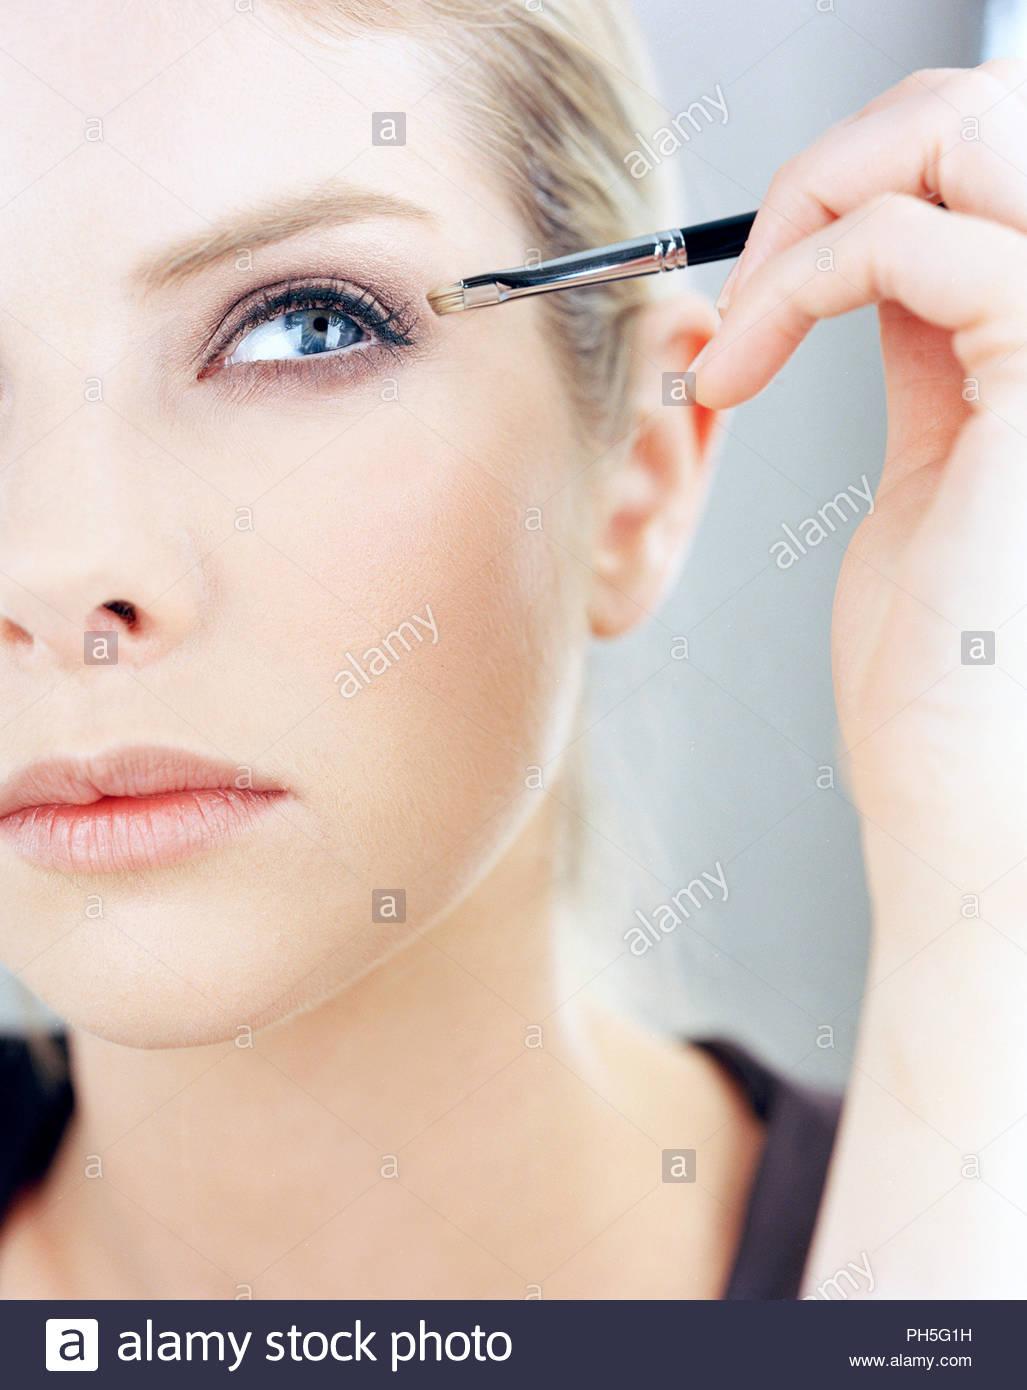 Young woman applying make-up - Stock Image